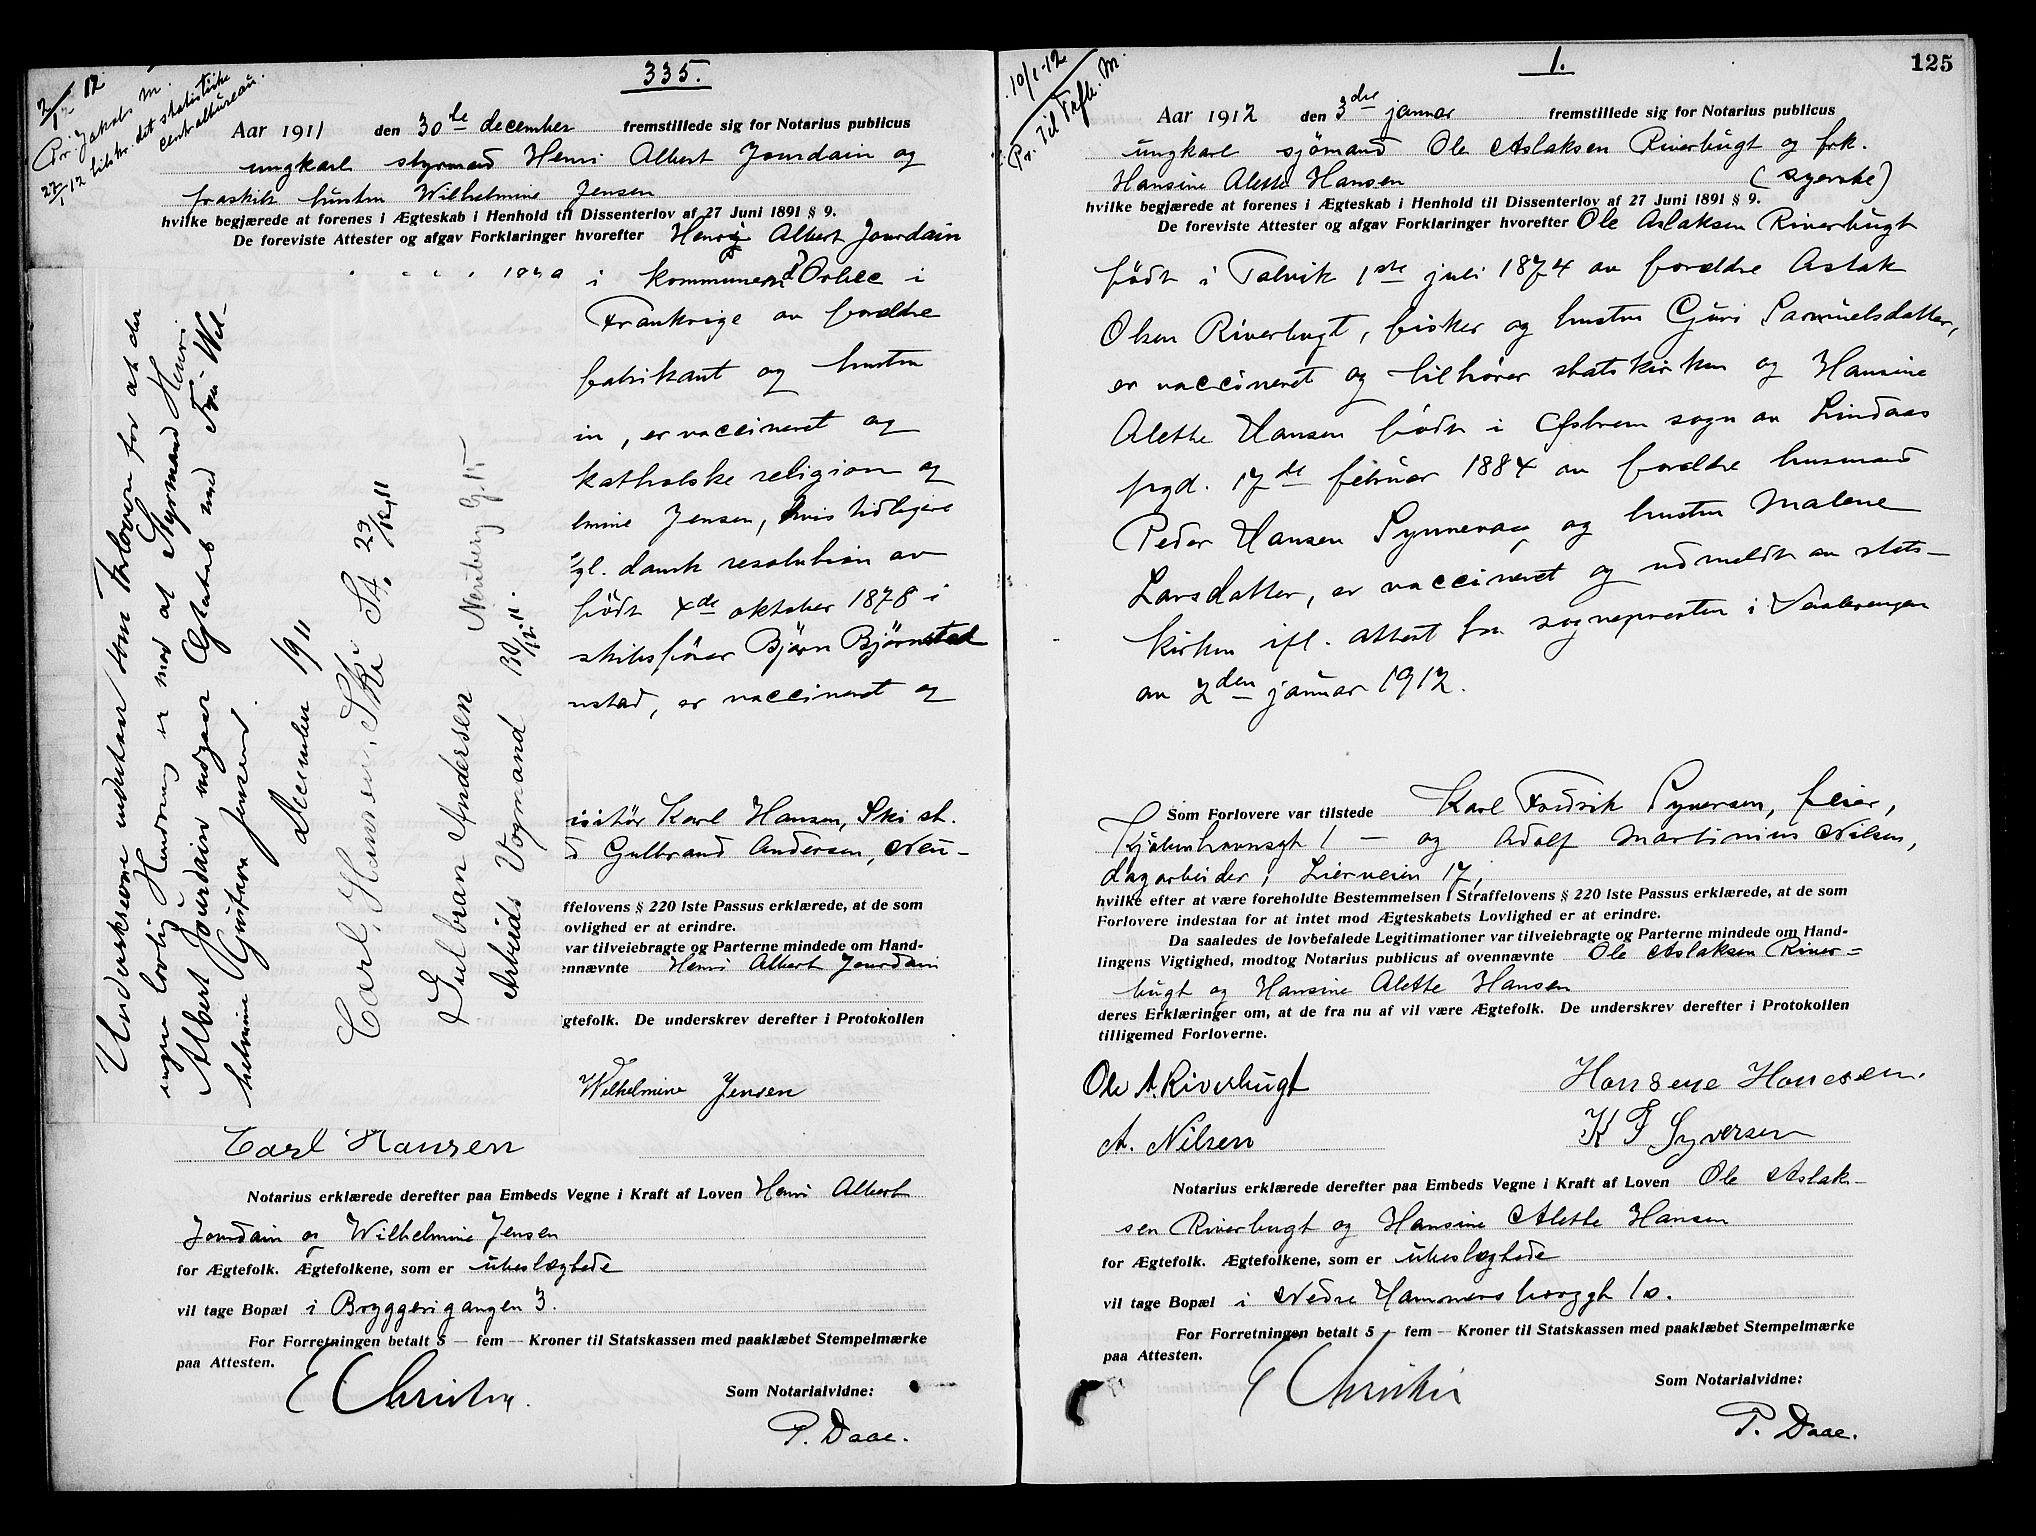 SAO, Oslo byfogd avd. I, L/Lb/Lbb/L0008: Notarialprotokoll, rekke II: Vigsler, 1911-1913, s. 124b-125a